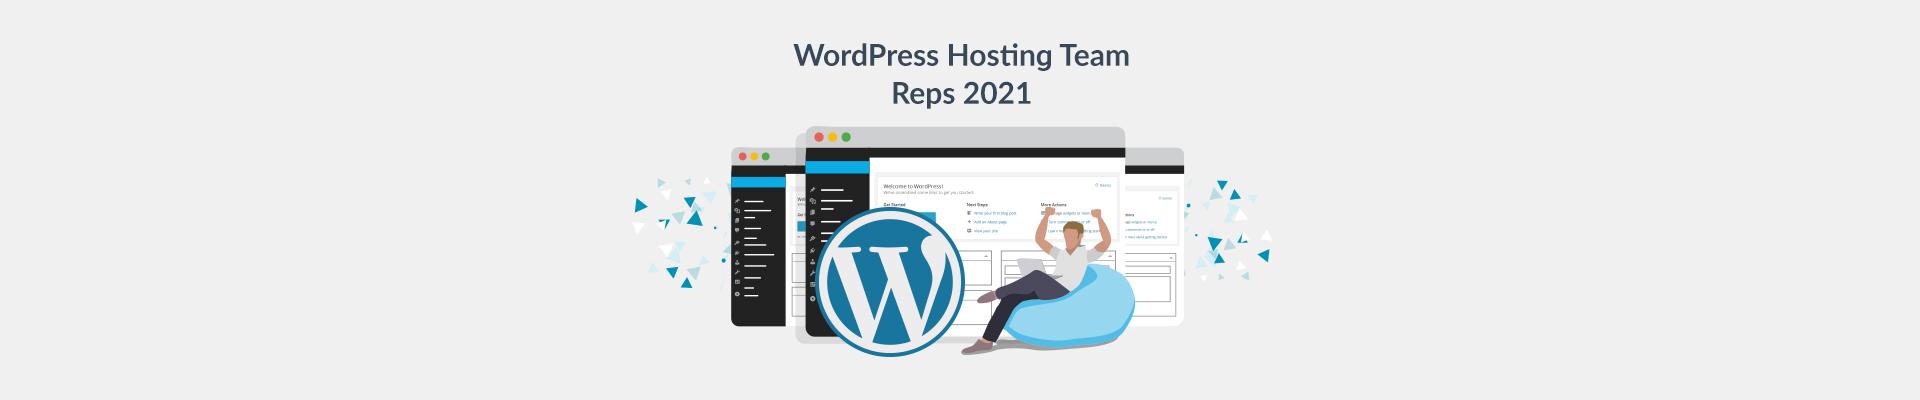 WordPress hosting reps Plesk blog